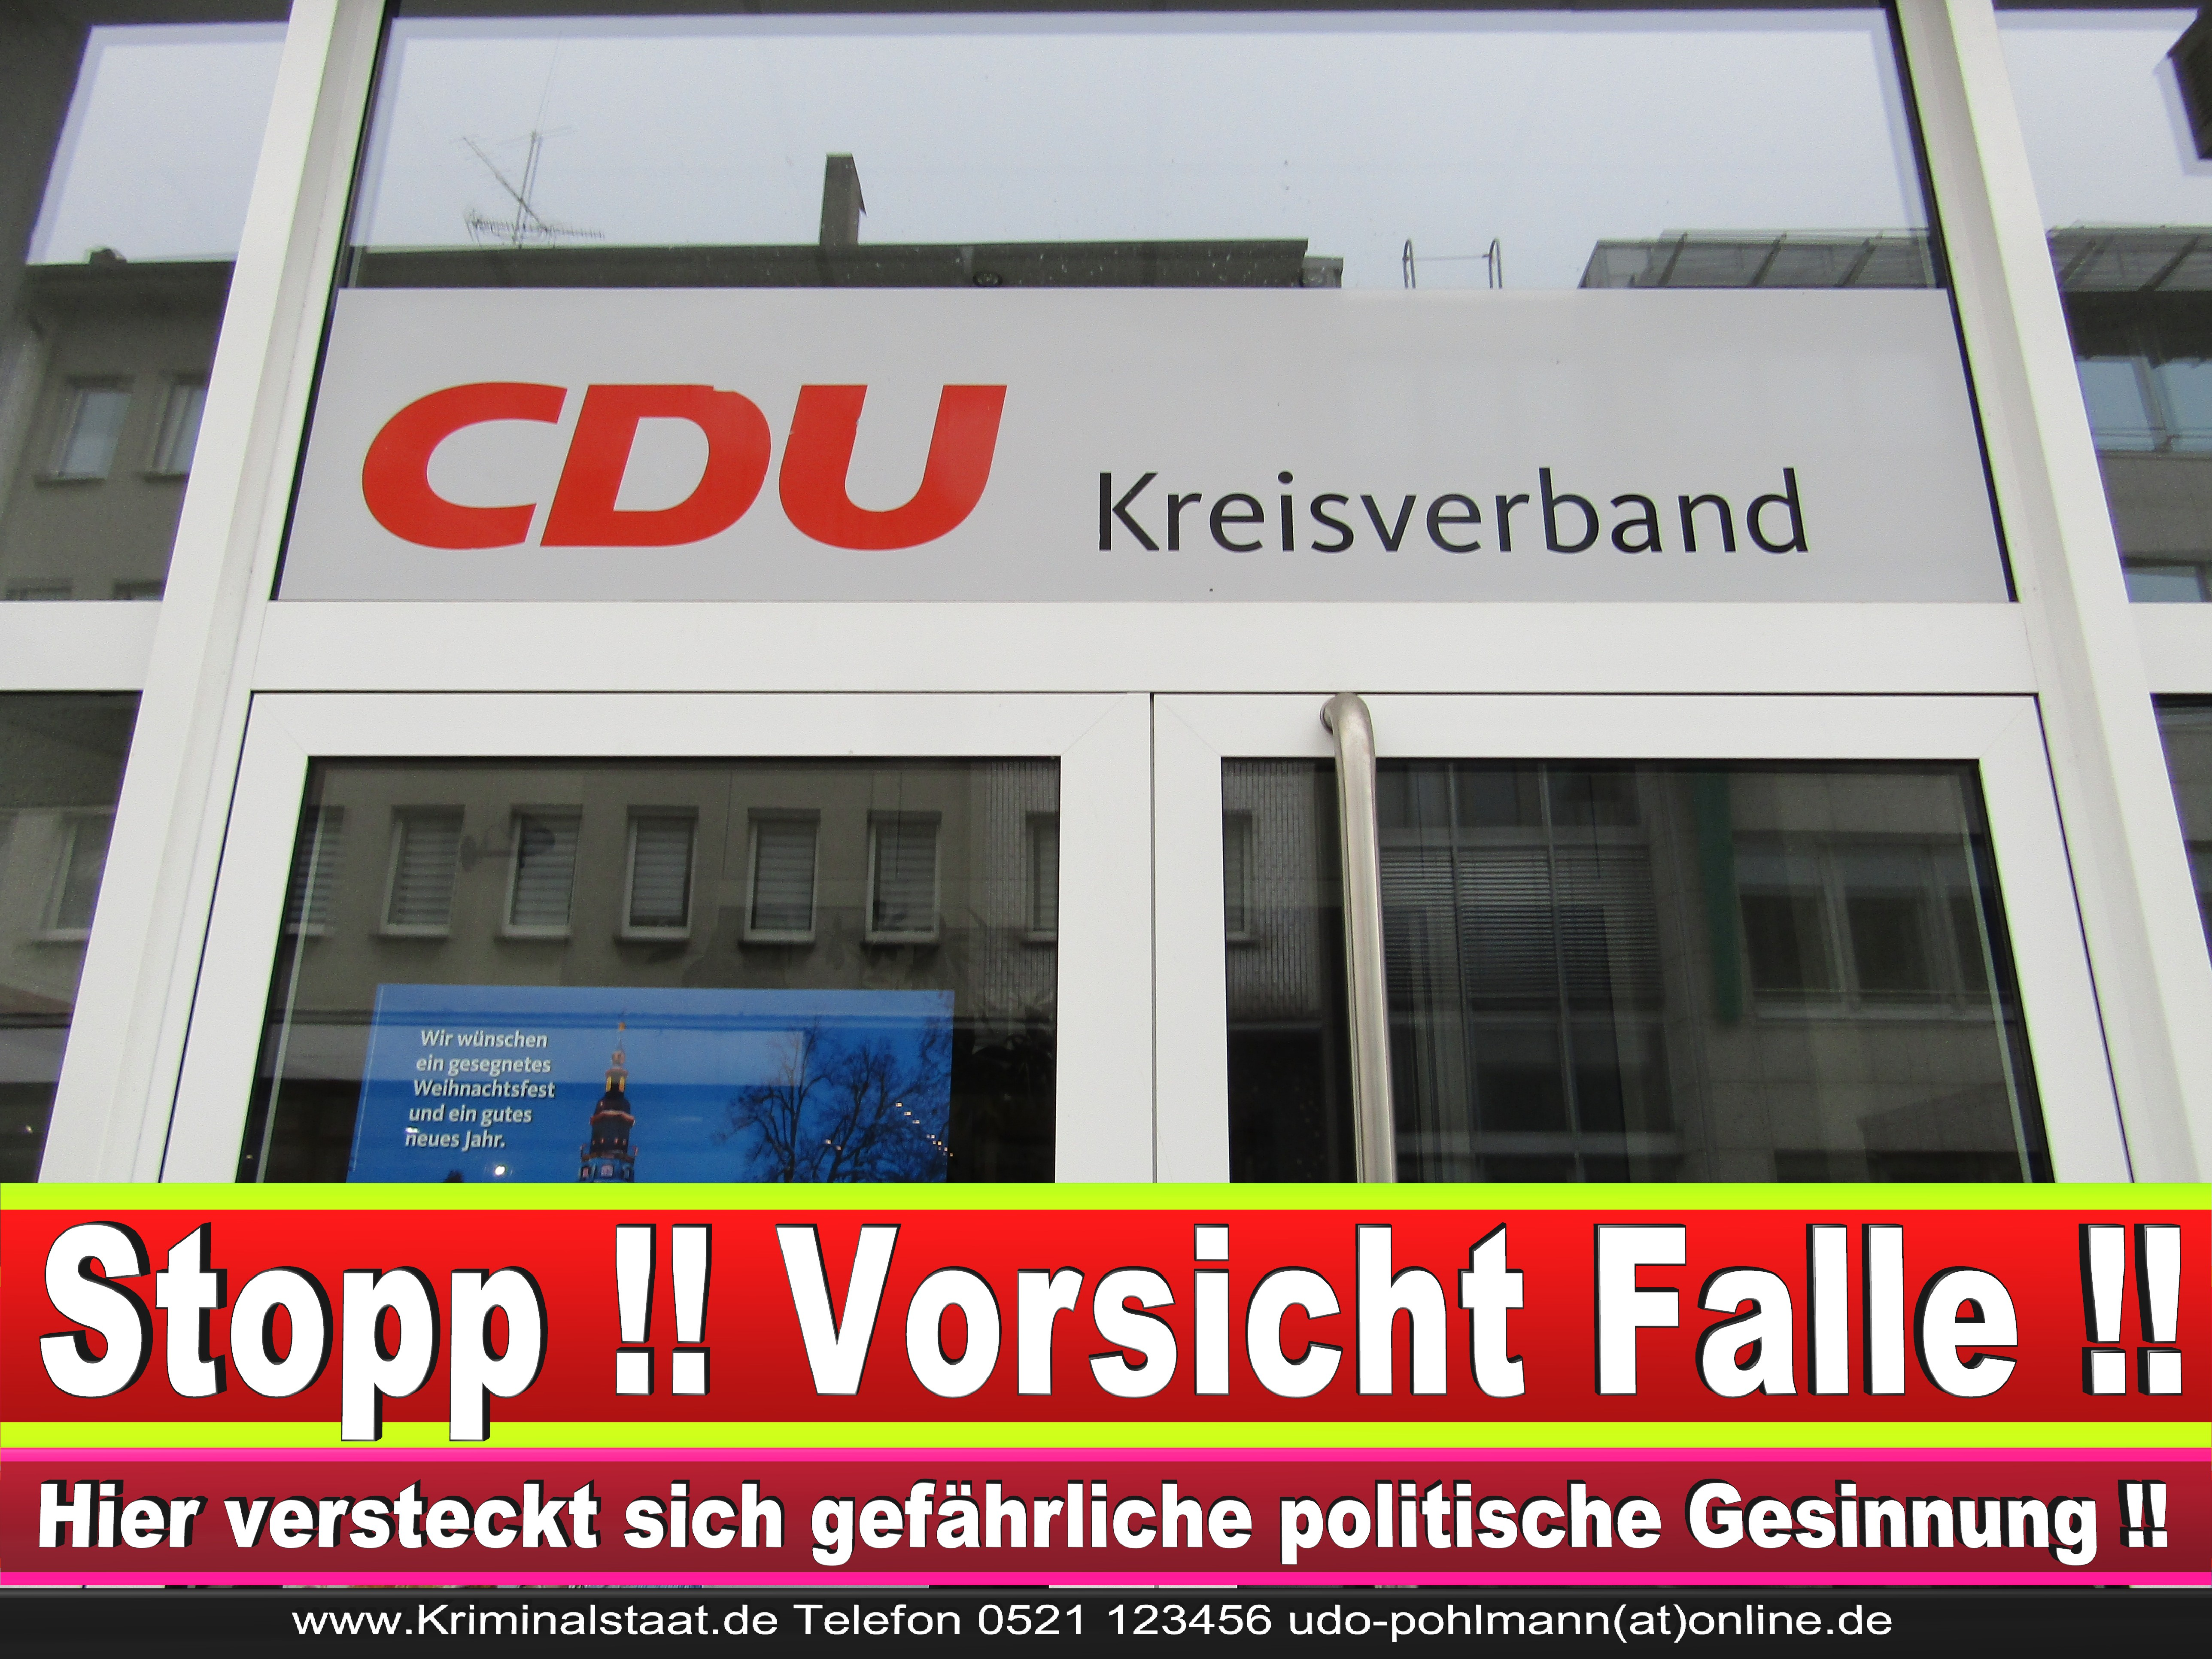 CDU DORTMUND KREISVERBAND BüRGERBüRO CDU FRAKTION ORTSVERBAND CDU NRW GESCHäFTSSTELLE ADRESSE RATSMITGLIEDER CDU (8) 1